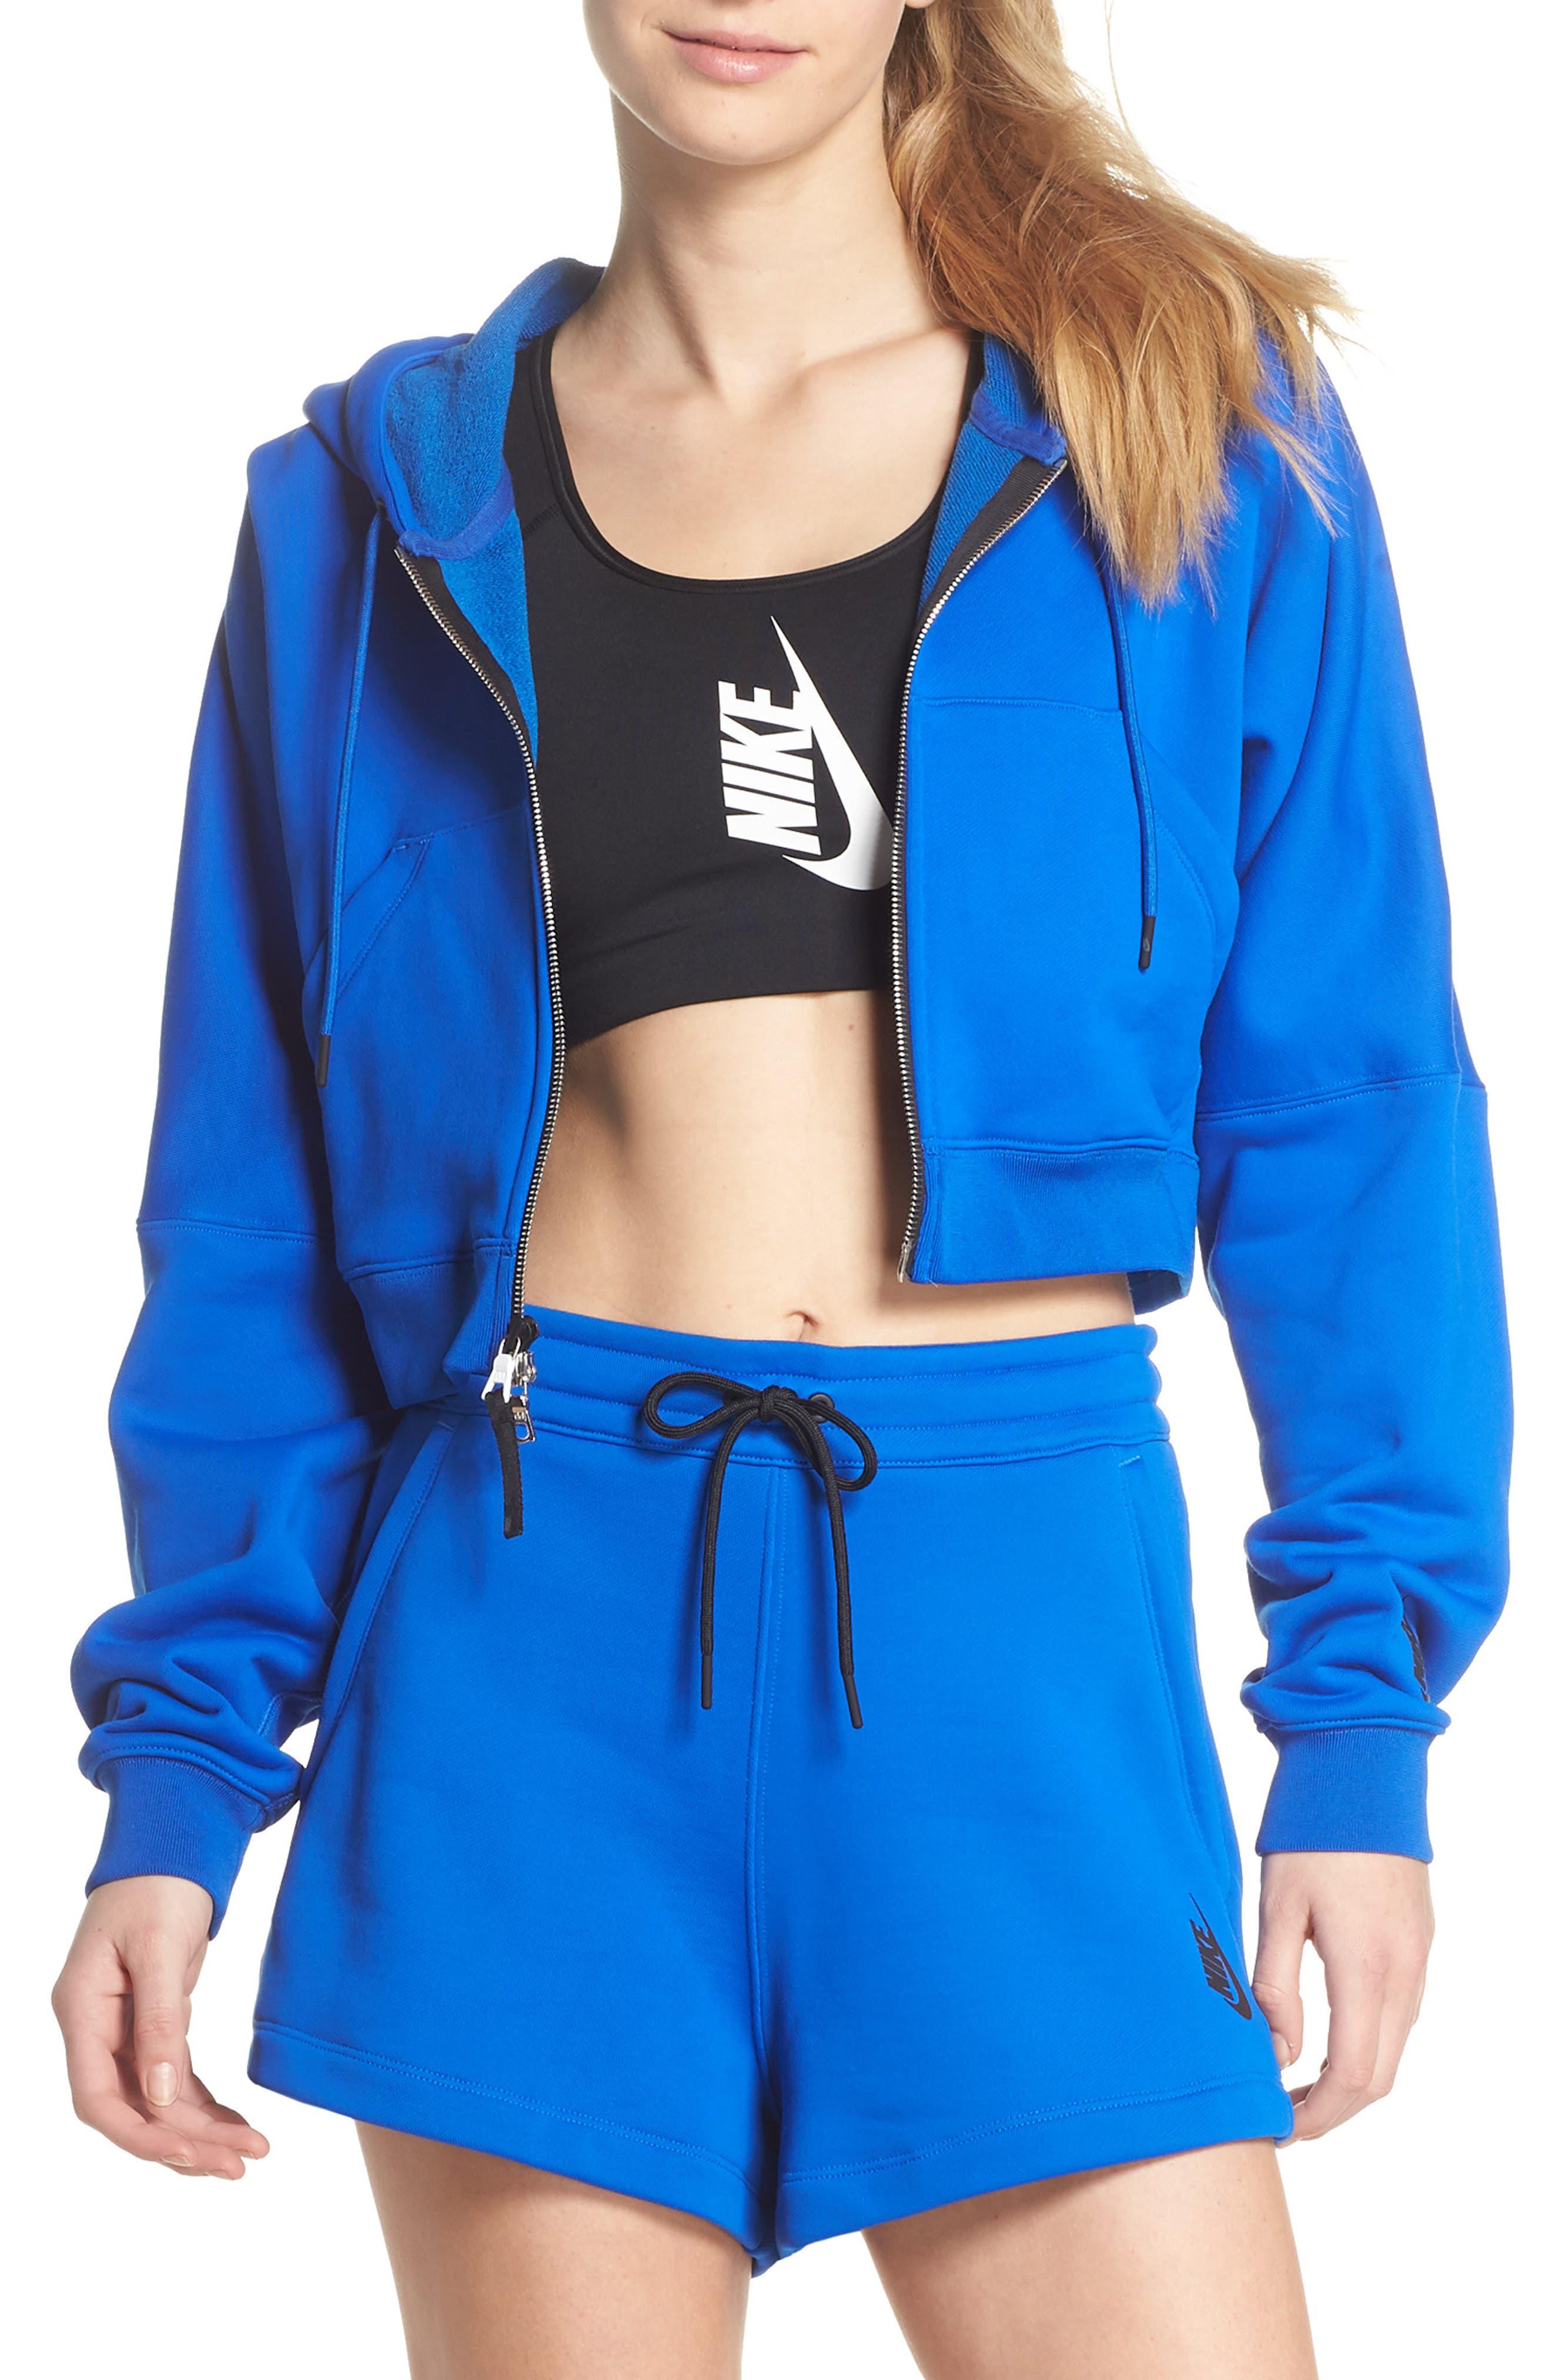 NikeLab Collection Terry Zip Hoodie,                         Main,                         color, Hyper Cobalt/ Black